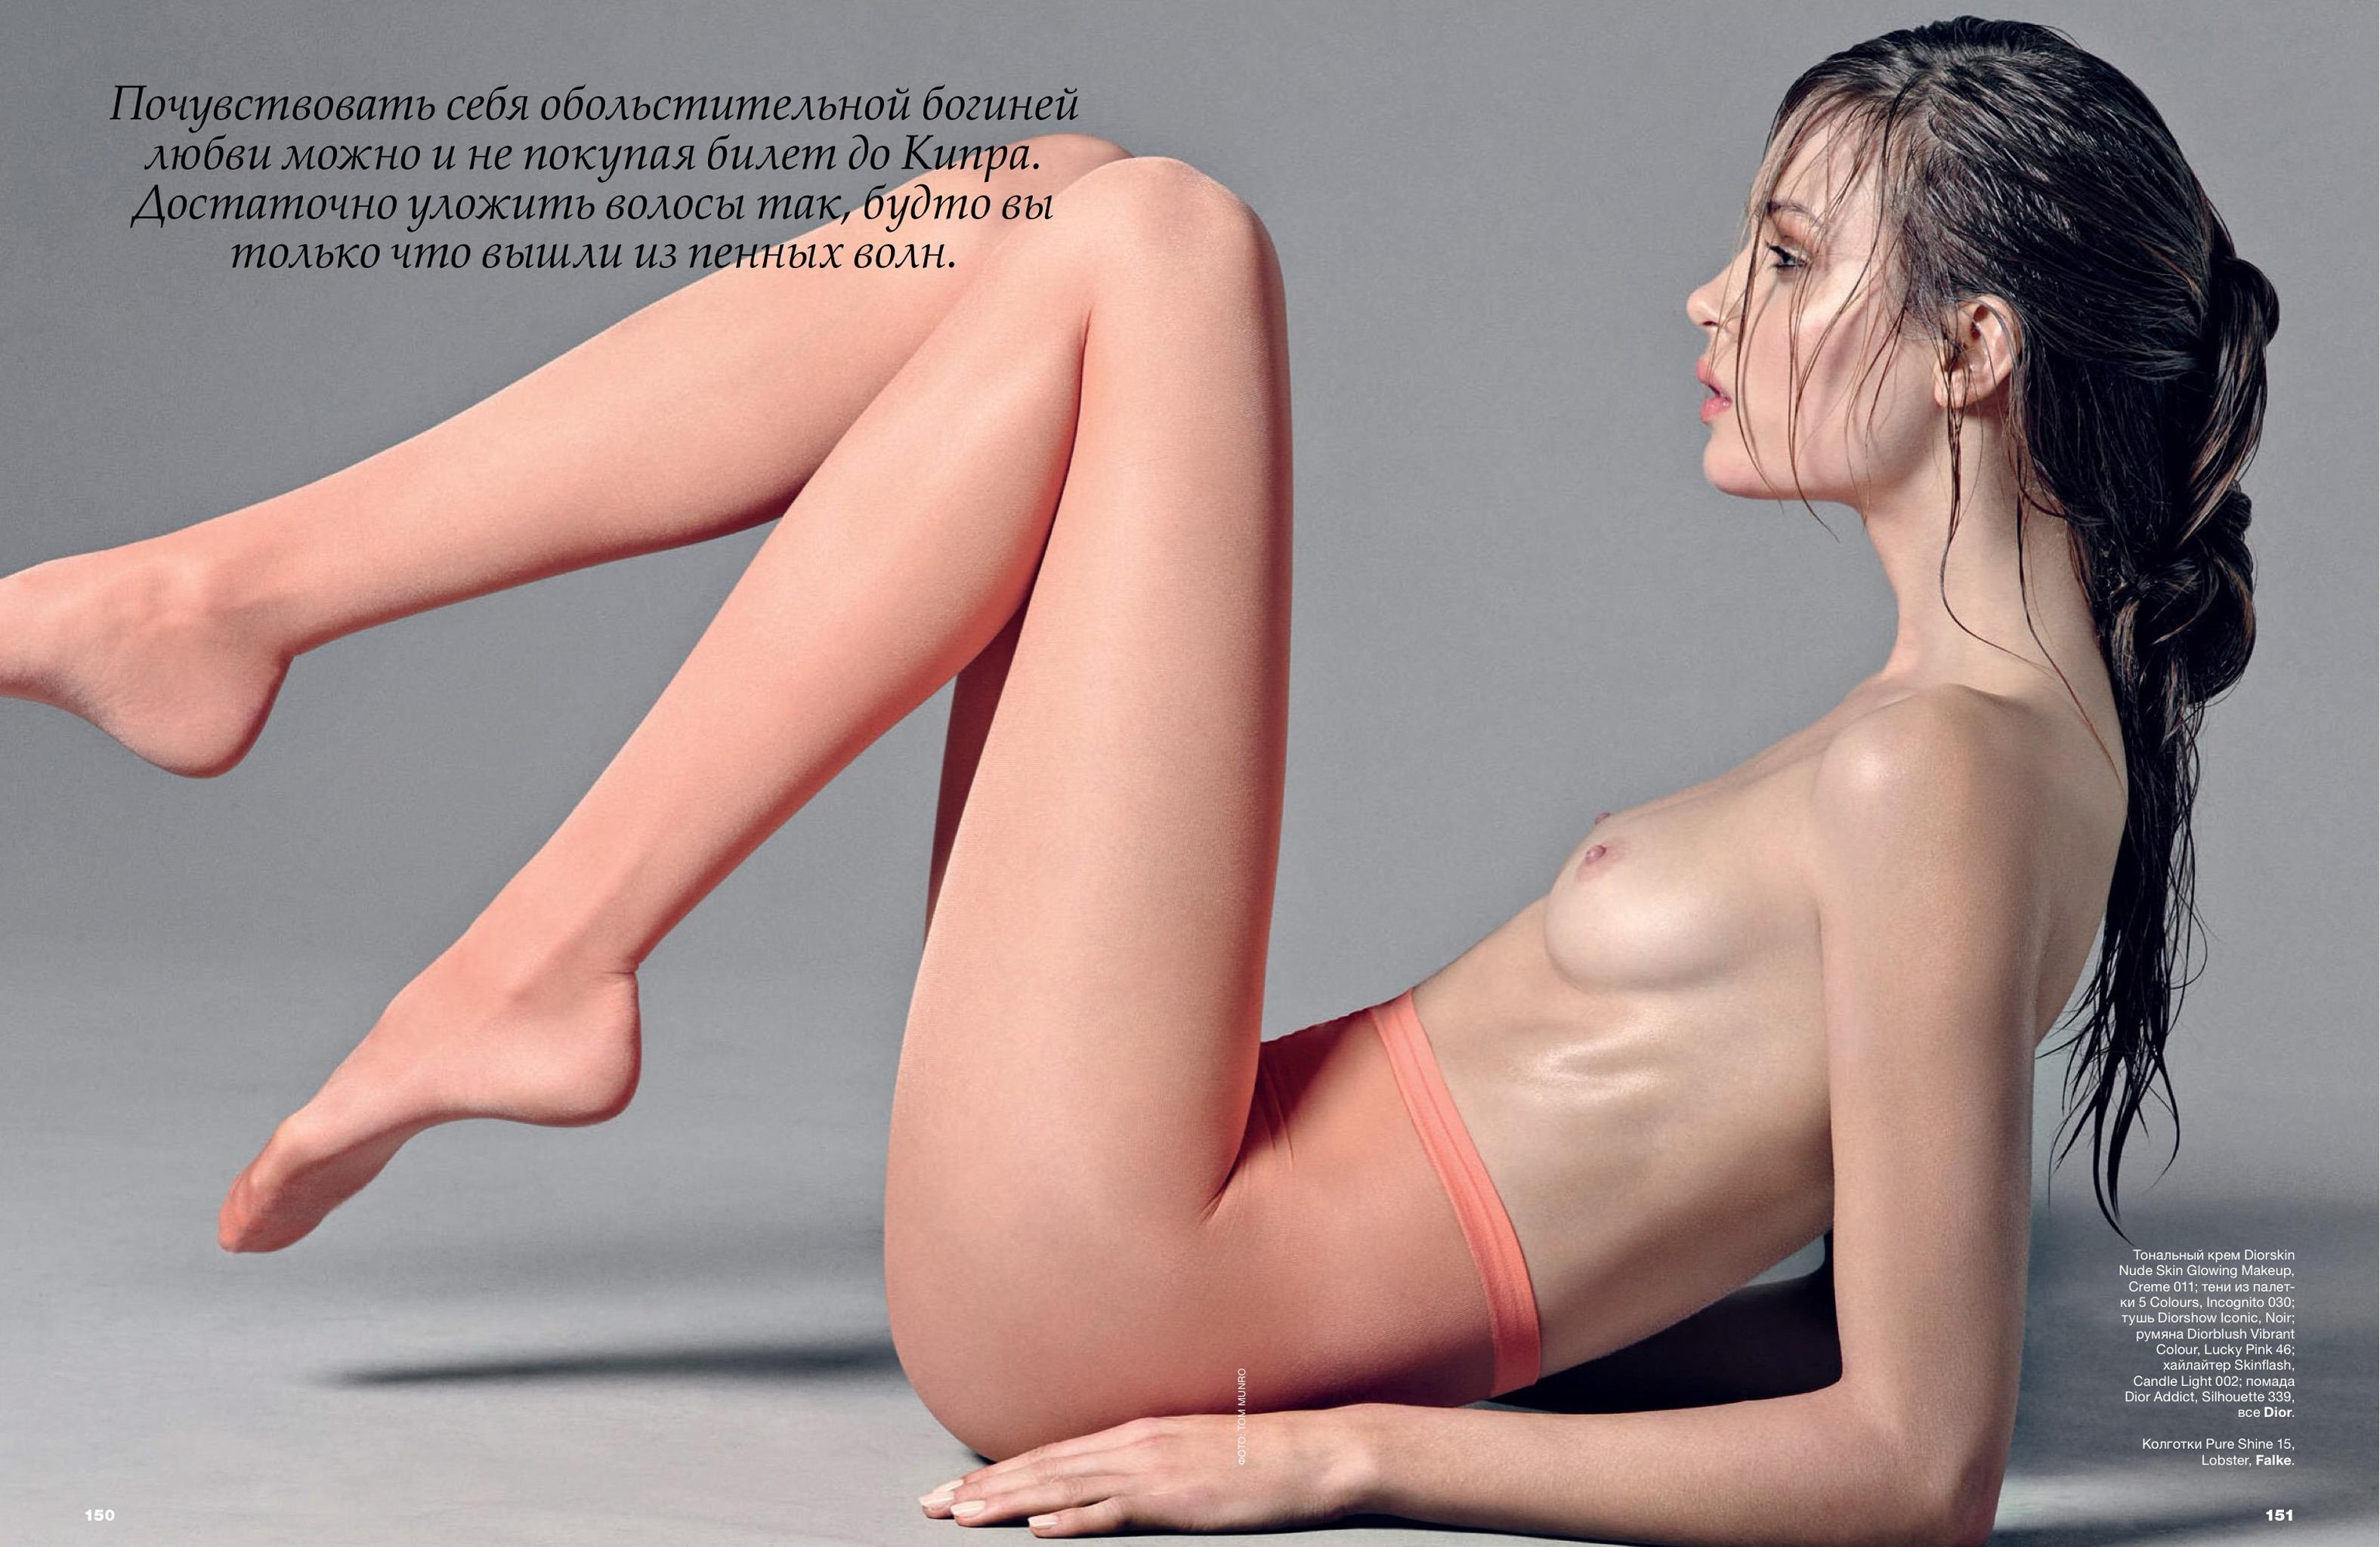 Fotos De Josephine Skriver Desnuda Fotos De Famosastk